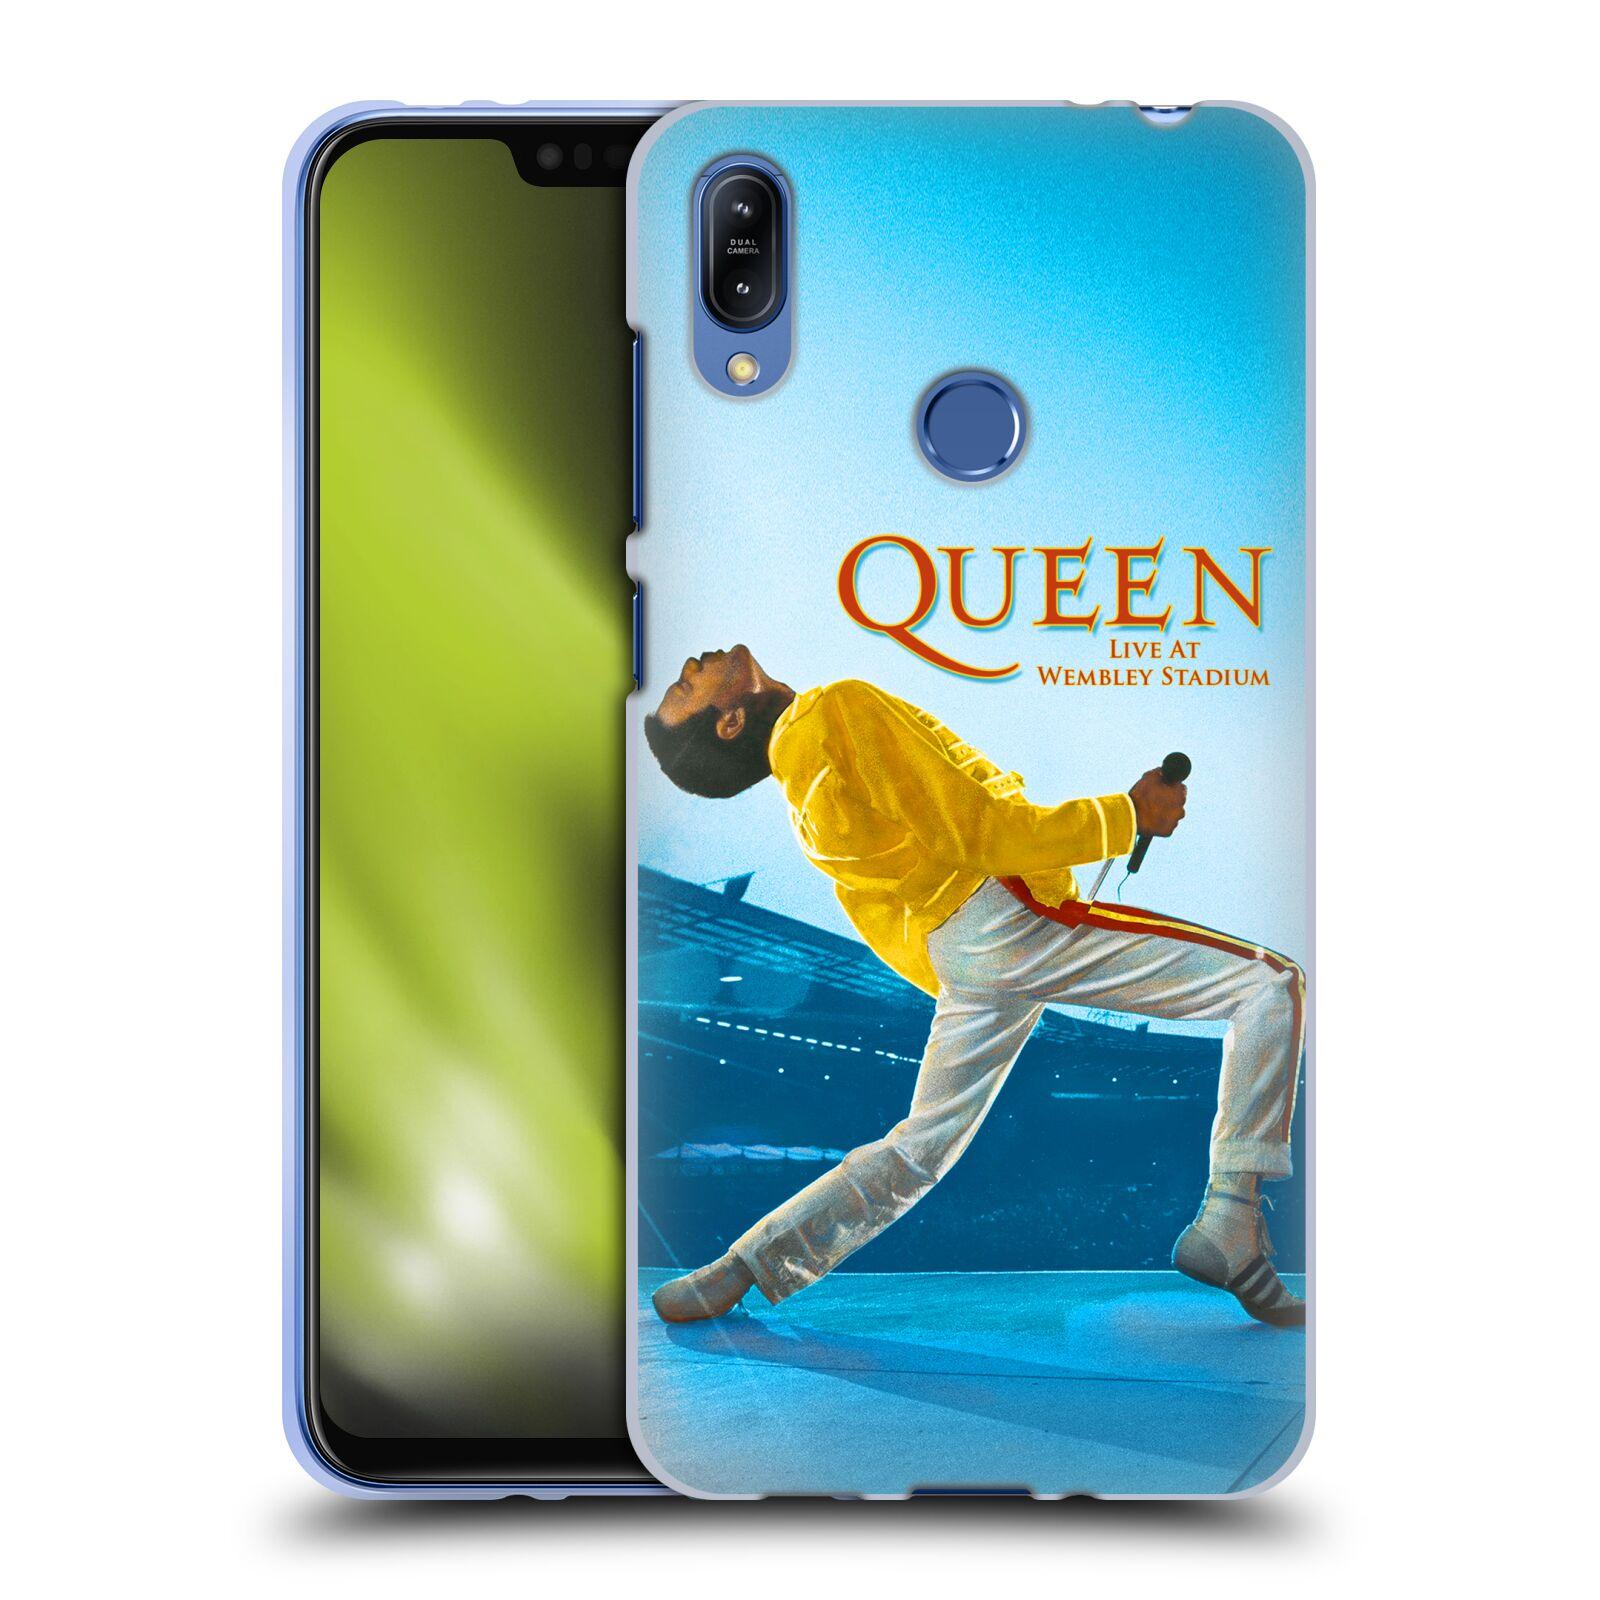 Silikonové pouzdro na mobil Asus Zenfone Max (M2) ZB633KL - Head Case - Queen - Freddie Mercury